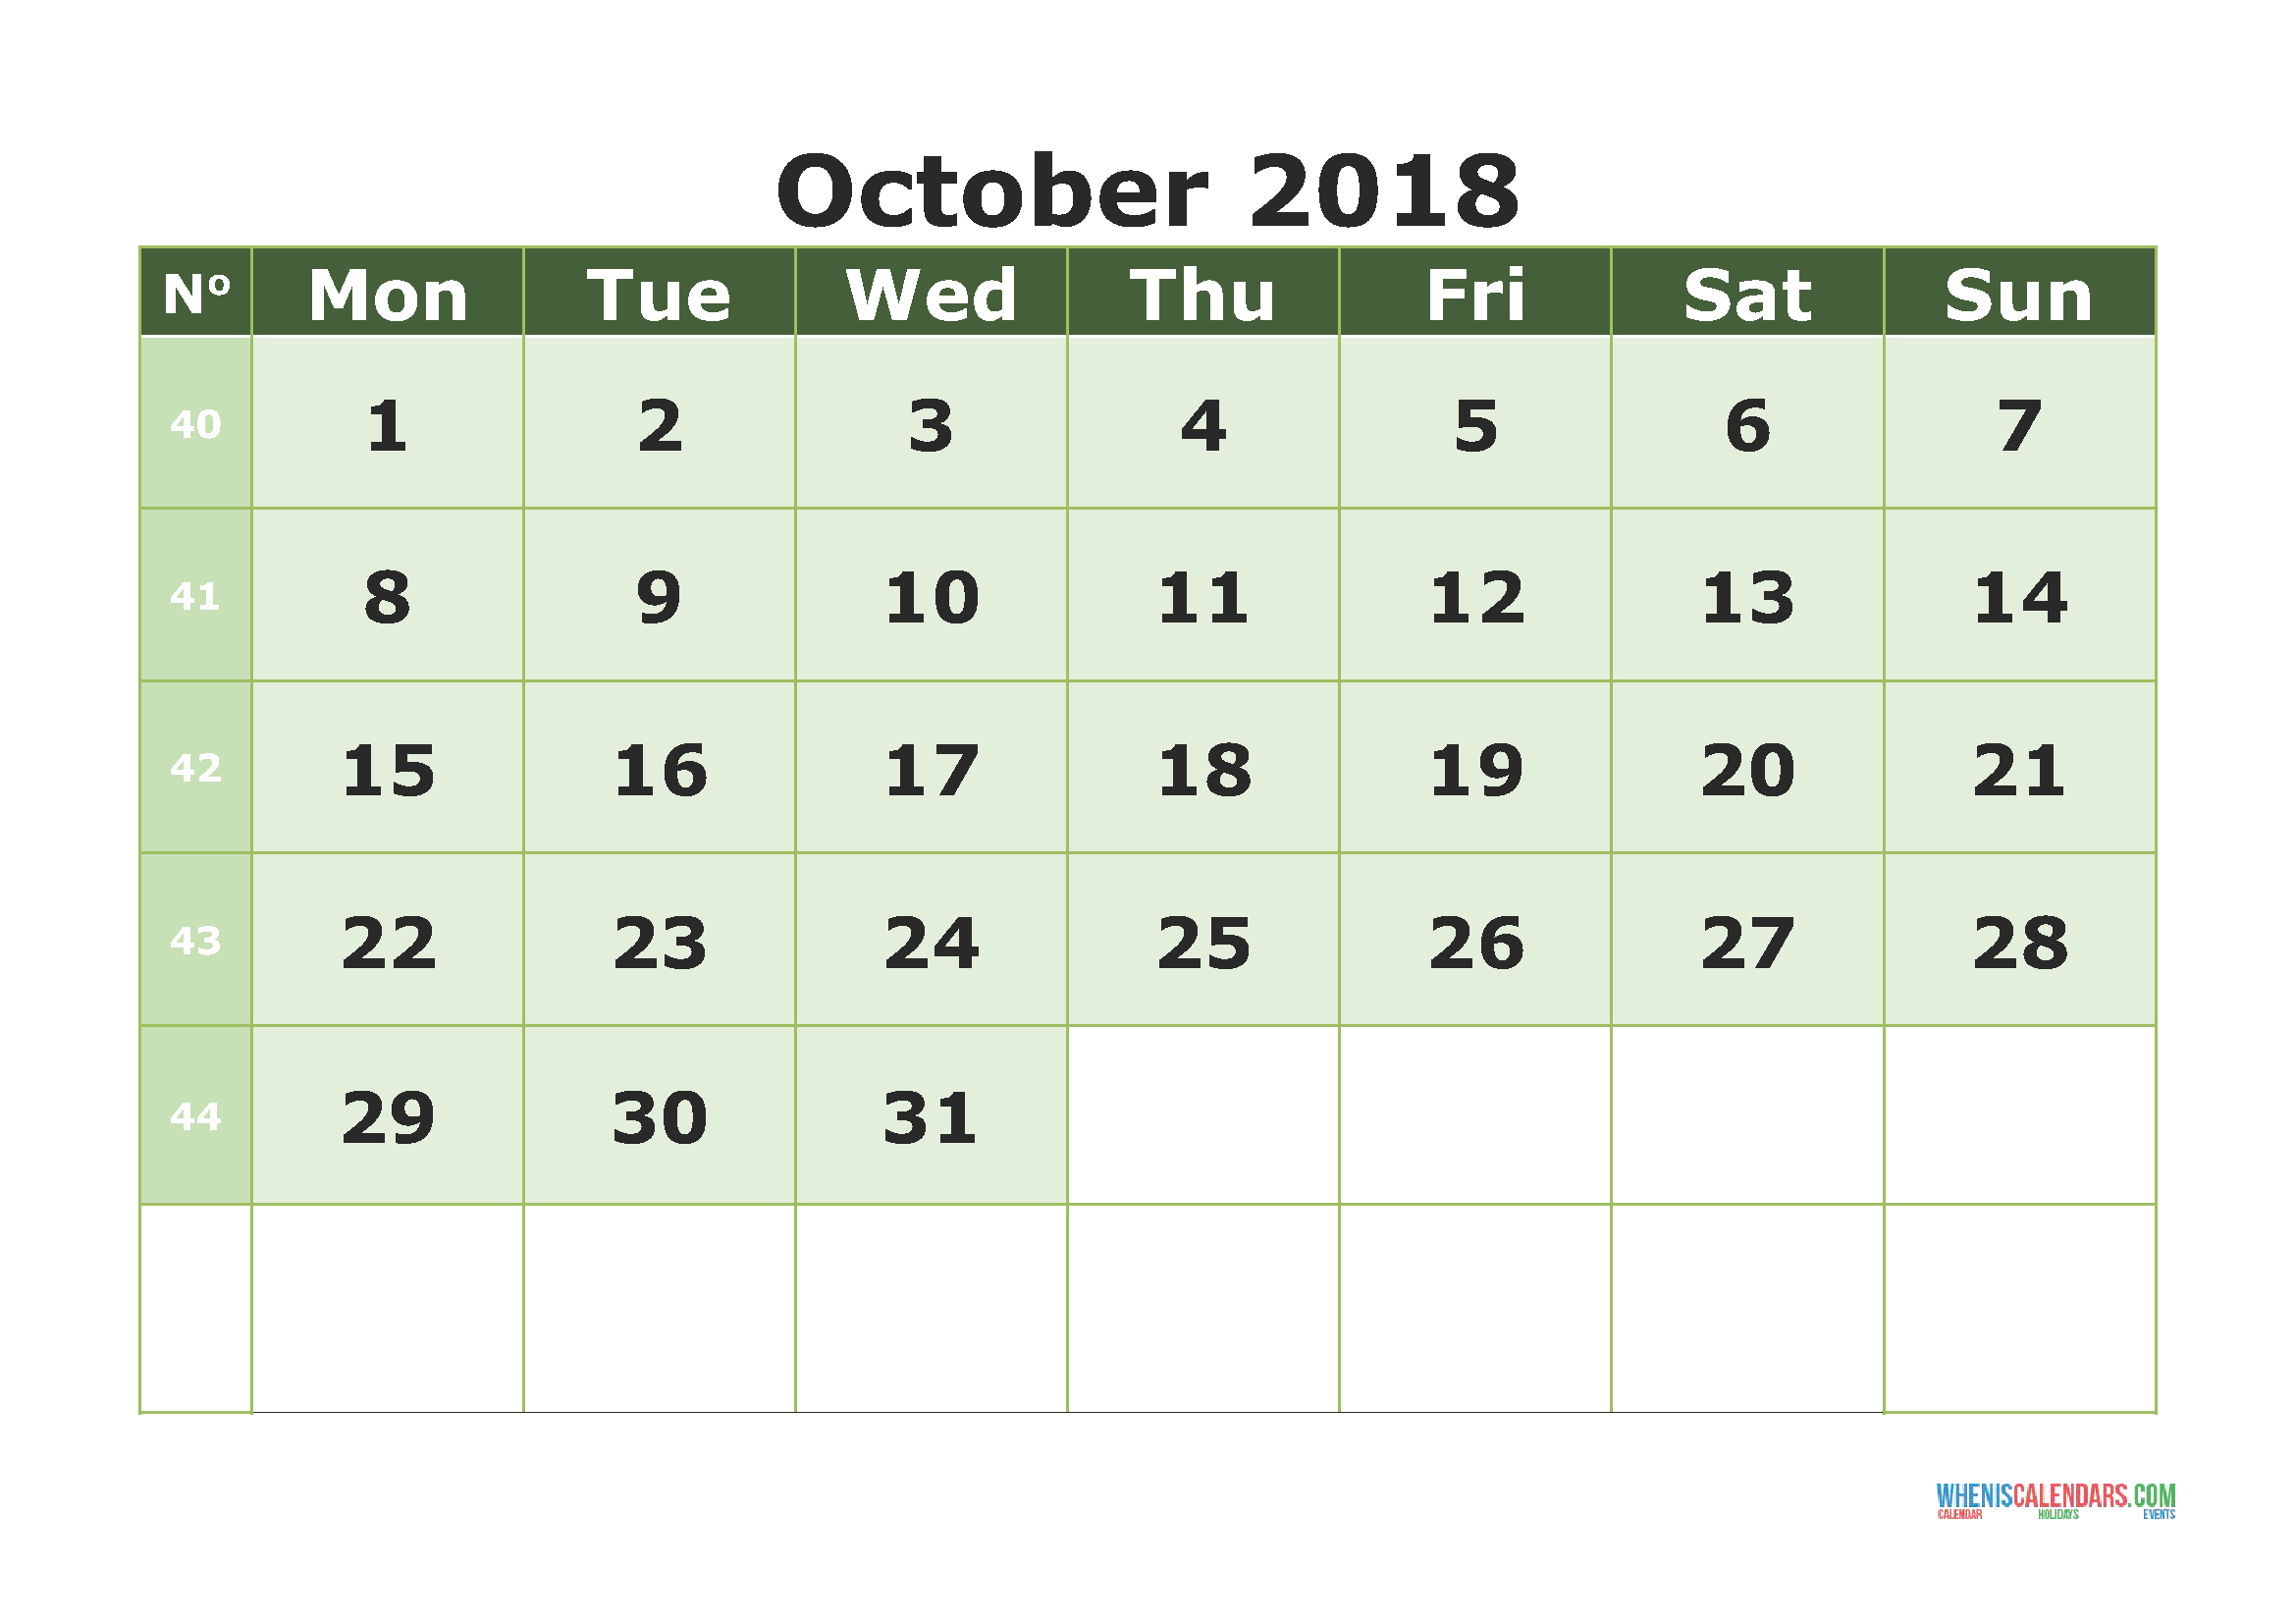 Printable Calendar October 2018 With Week Numbers (Monday